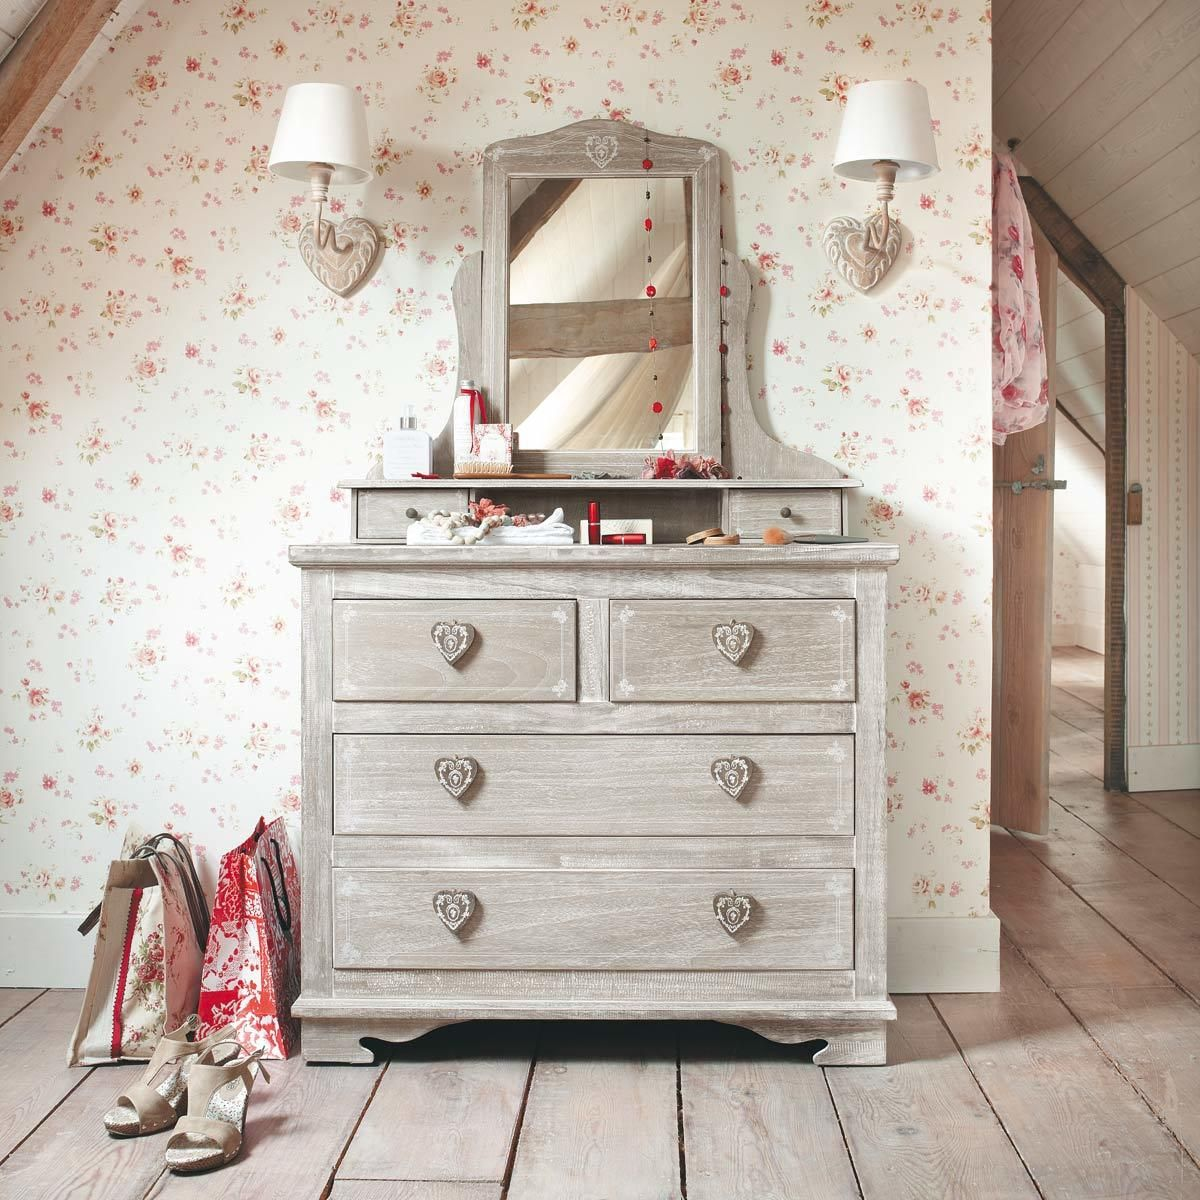 Coiffeuse 4 tiroirs en paulownia | Bedrooms ♥ | Deco ...